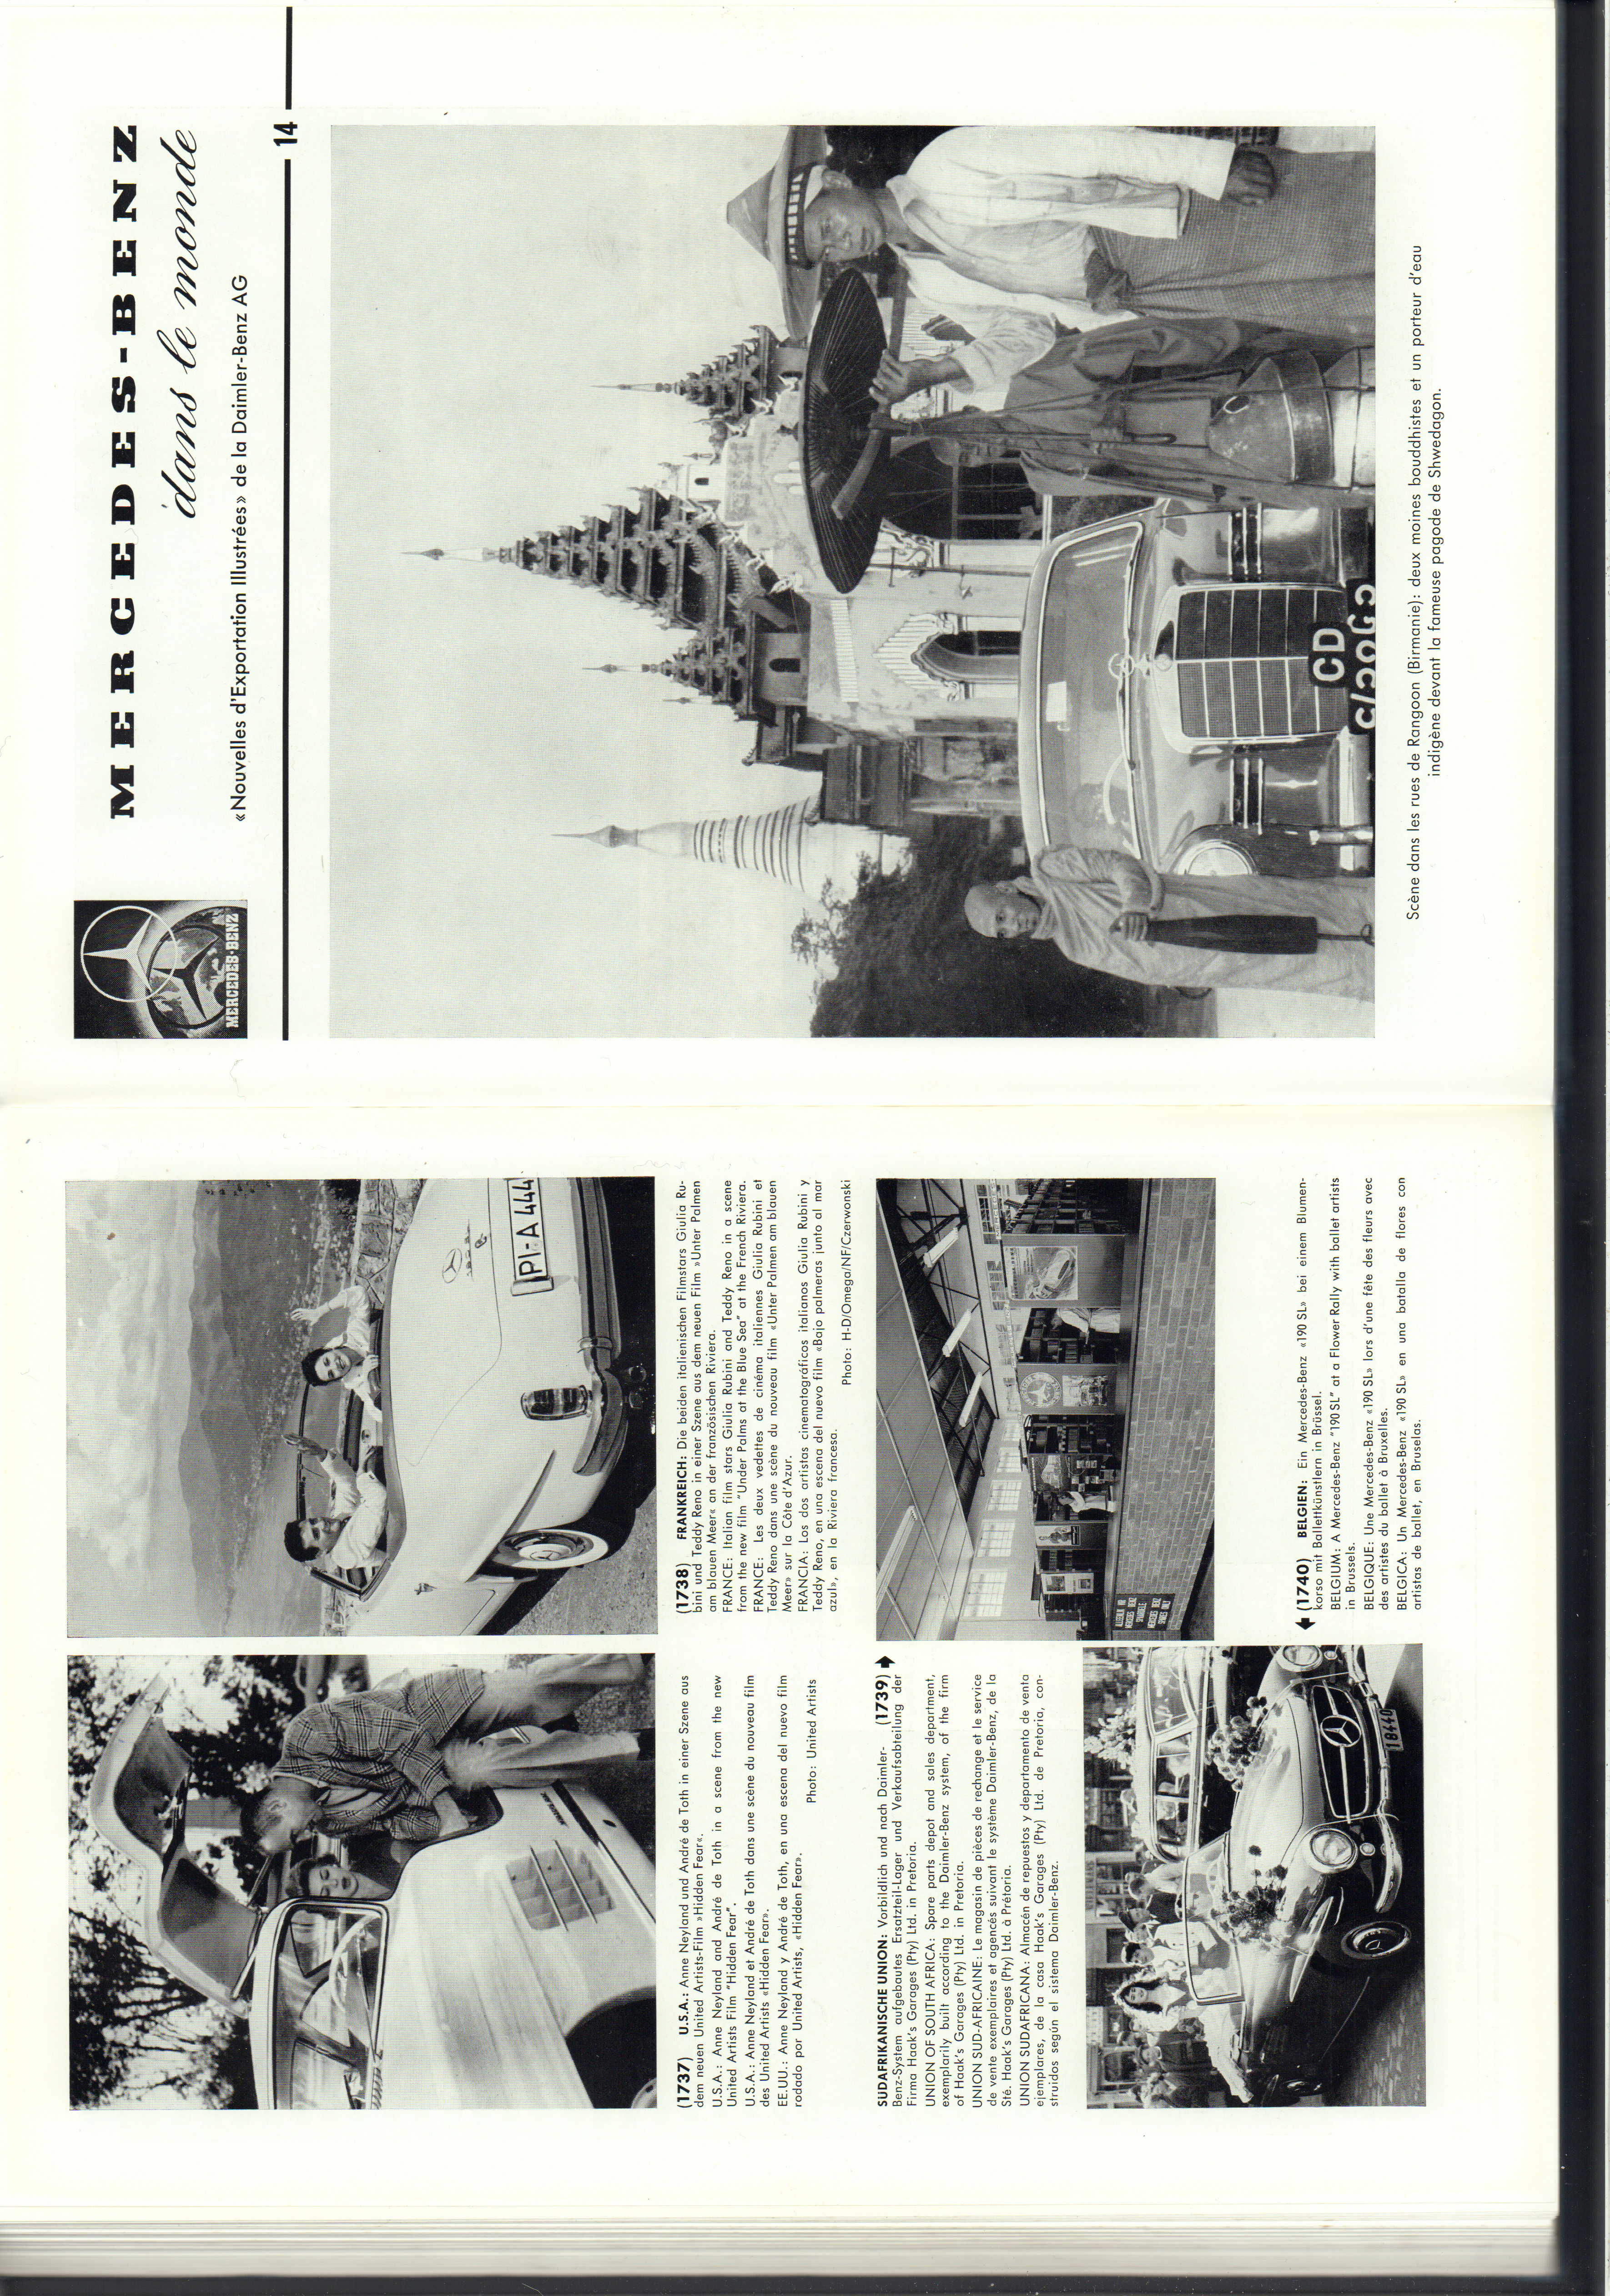 (REVISTA): Periódico In aller welt n.º 14 - Mercedes-Benz no mundo - 1957 - multilingue 001